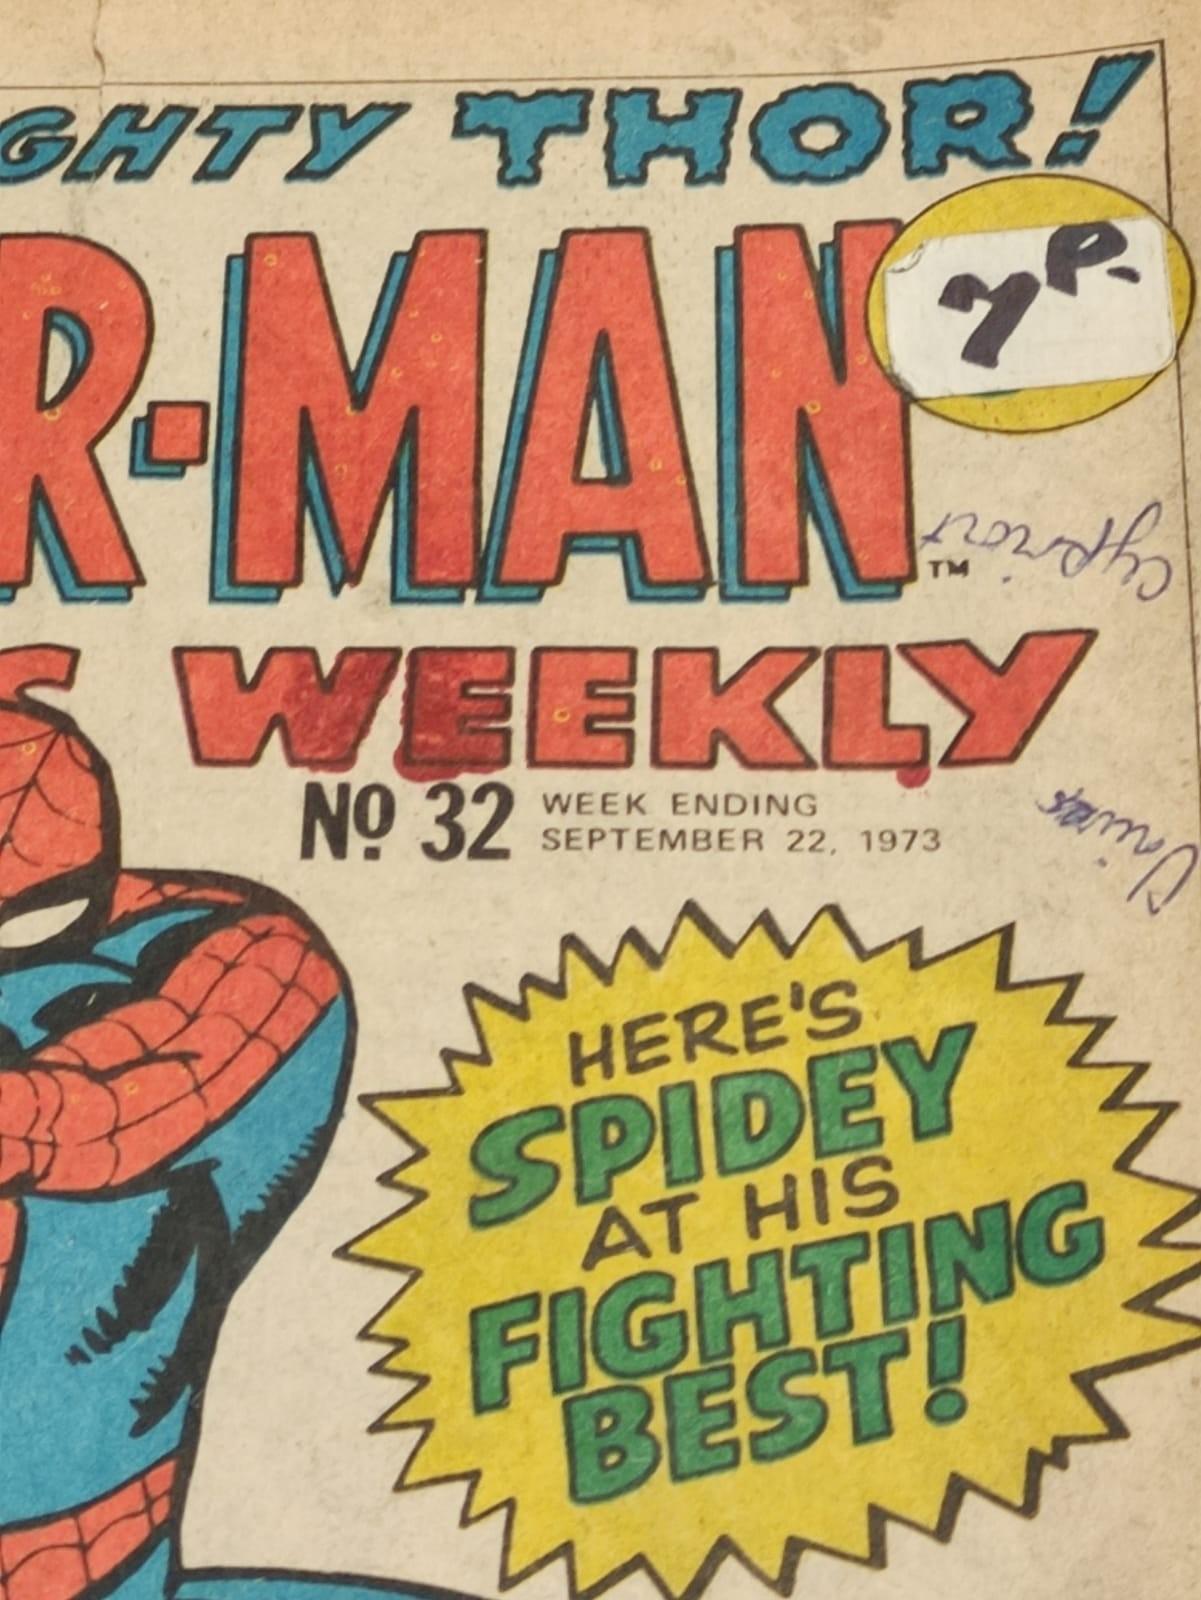 6 x Marvel comics. 1973 Spider-Man comics weekly. - Image 8 of 13